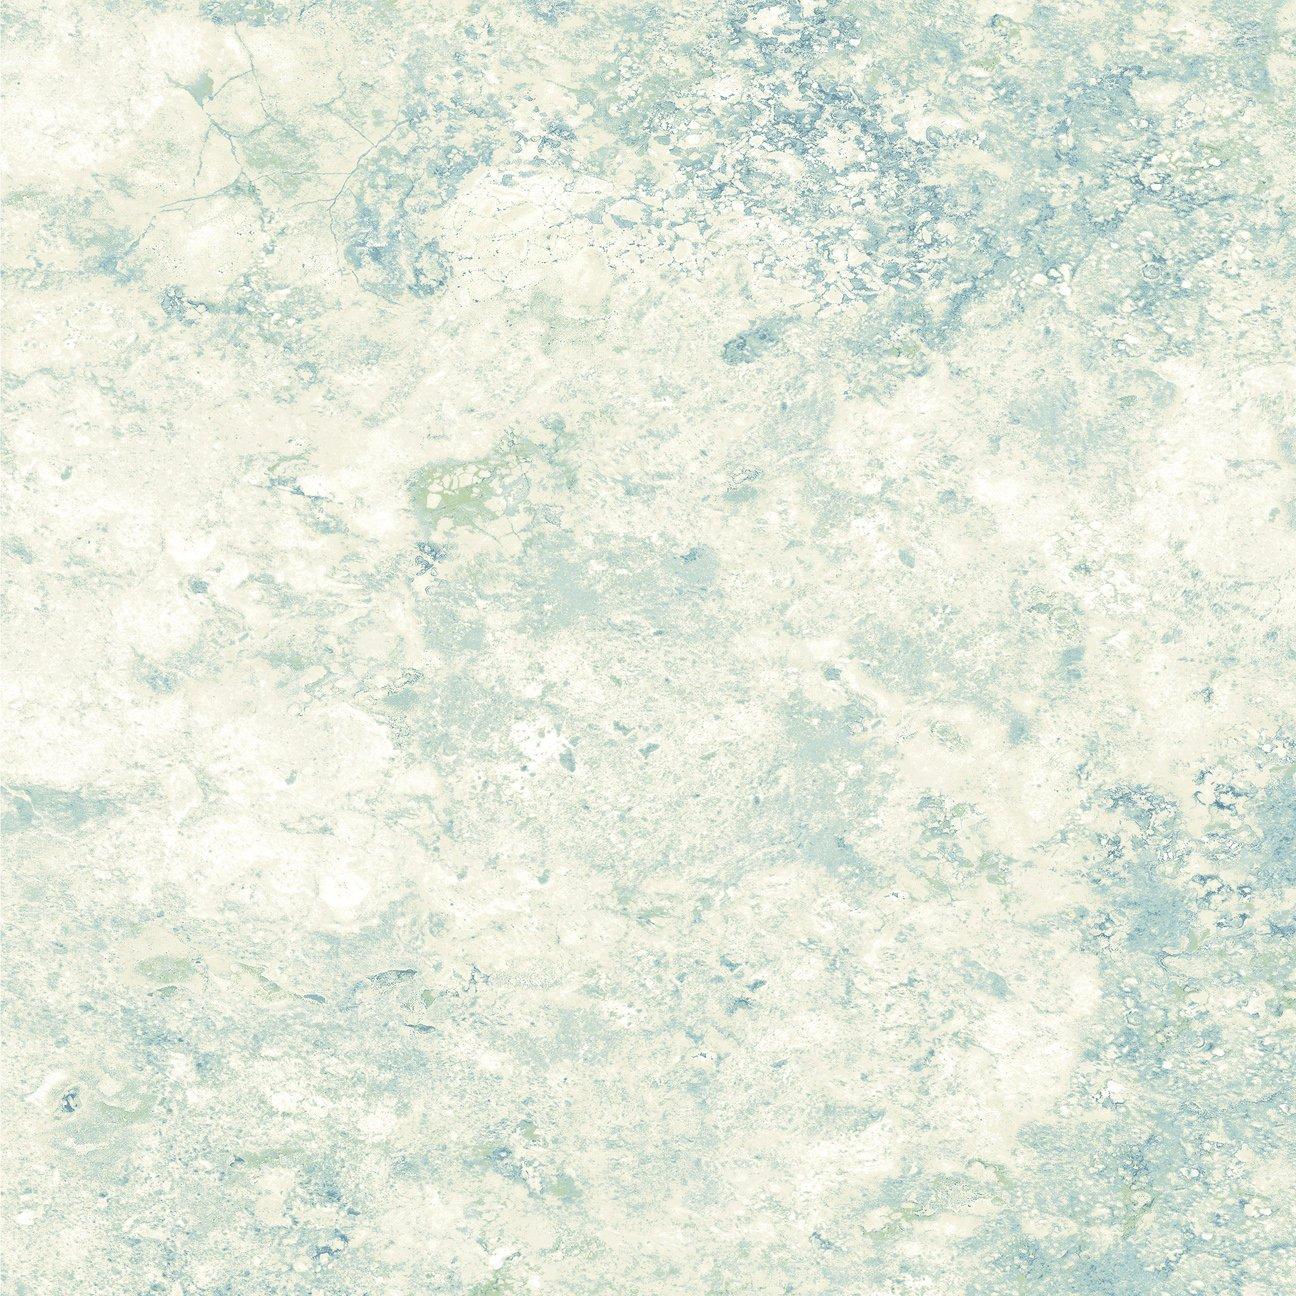 Stonehenge Gradations 39305-48 Blue Planet